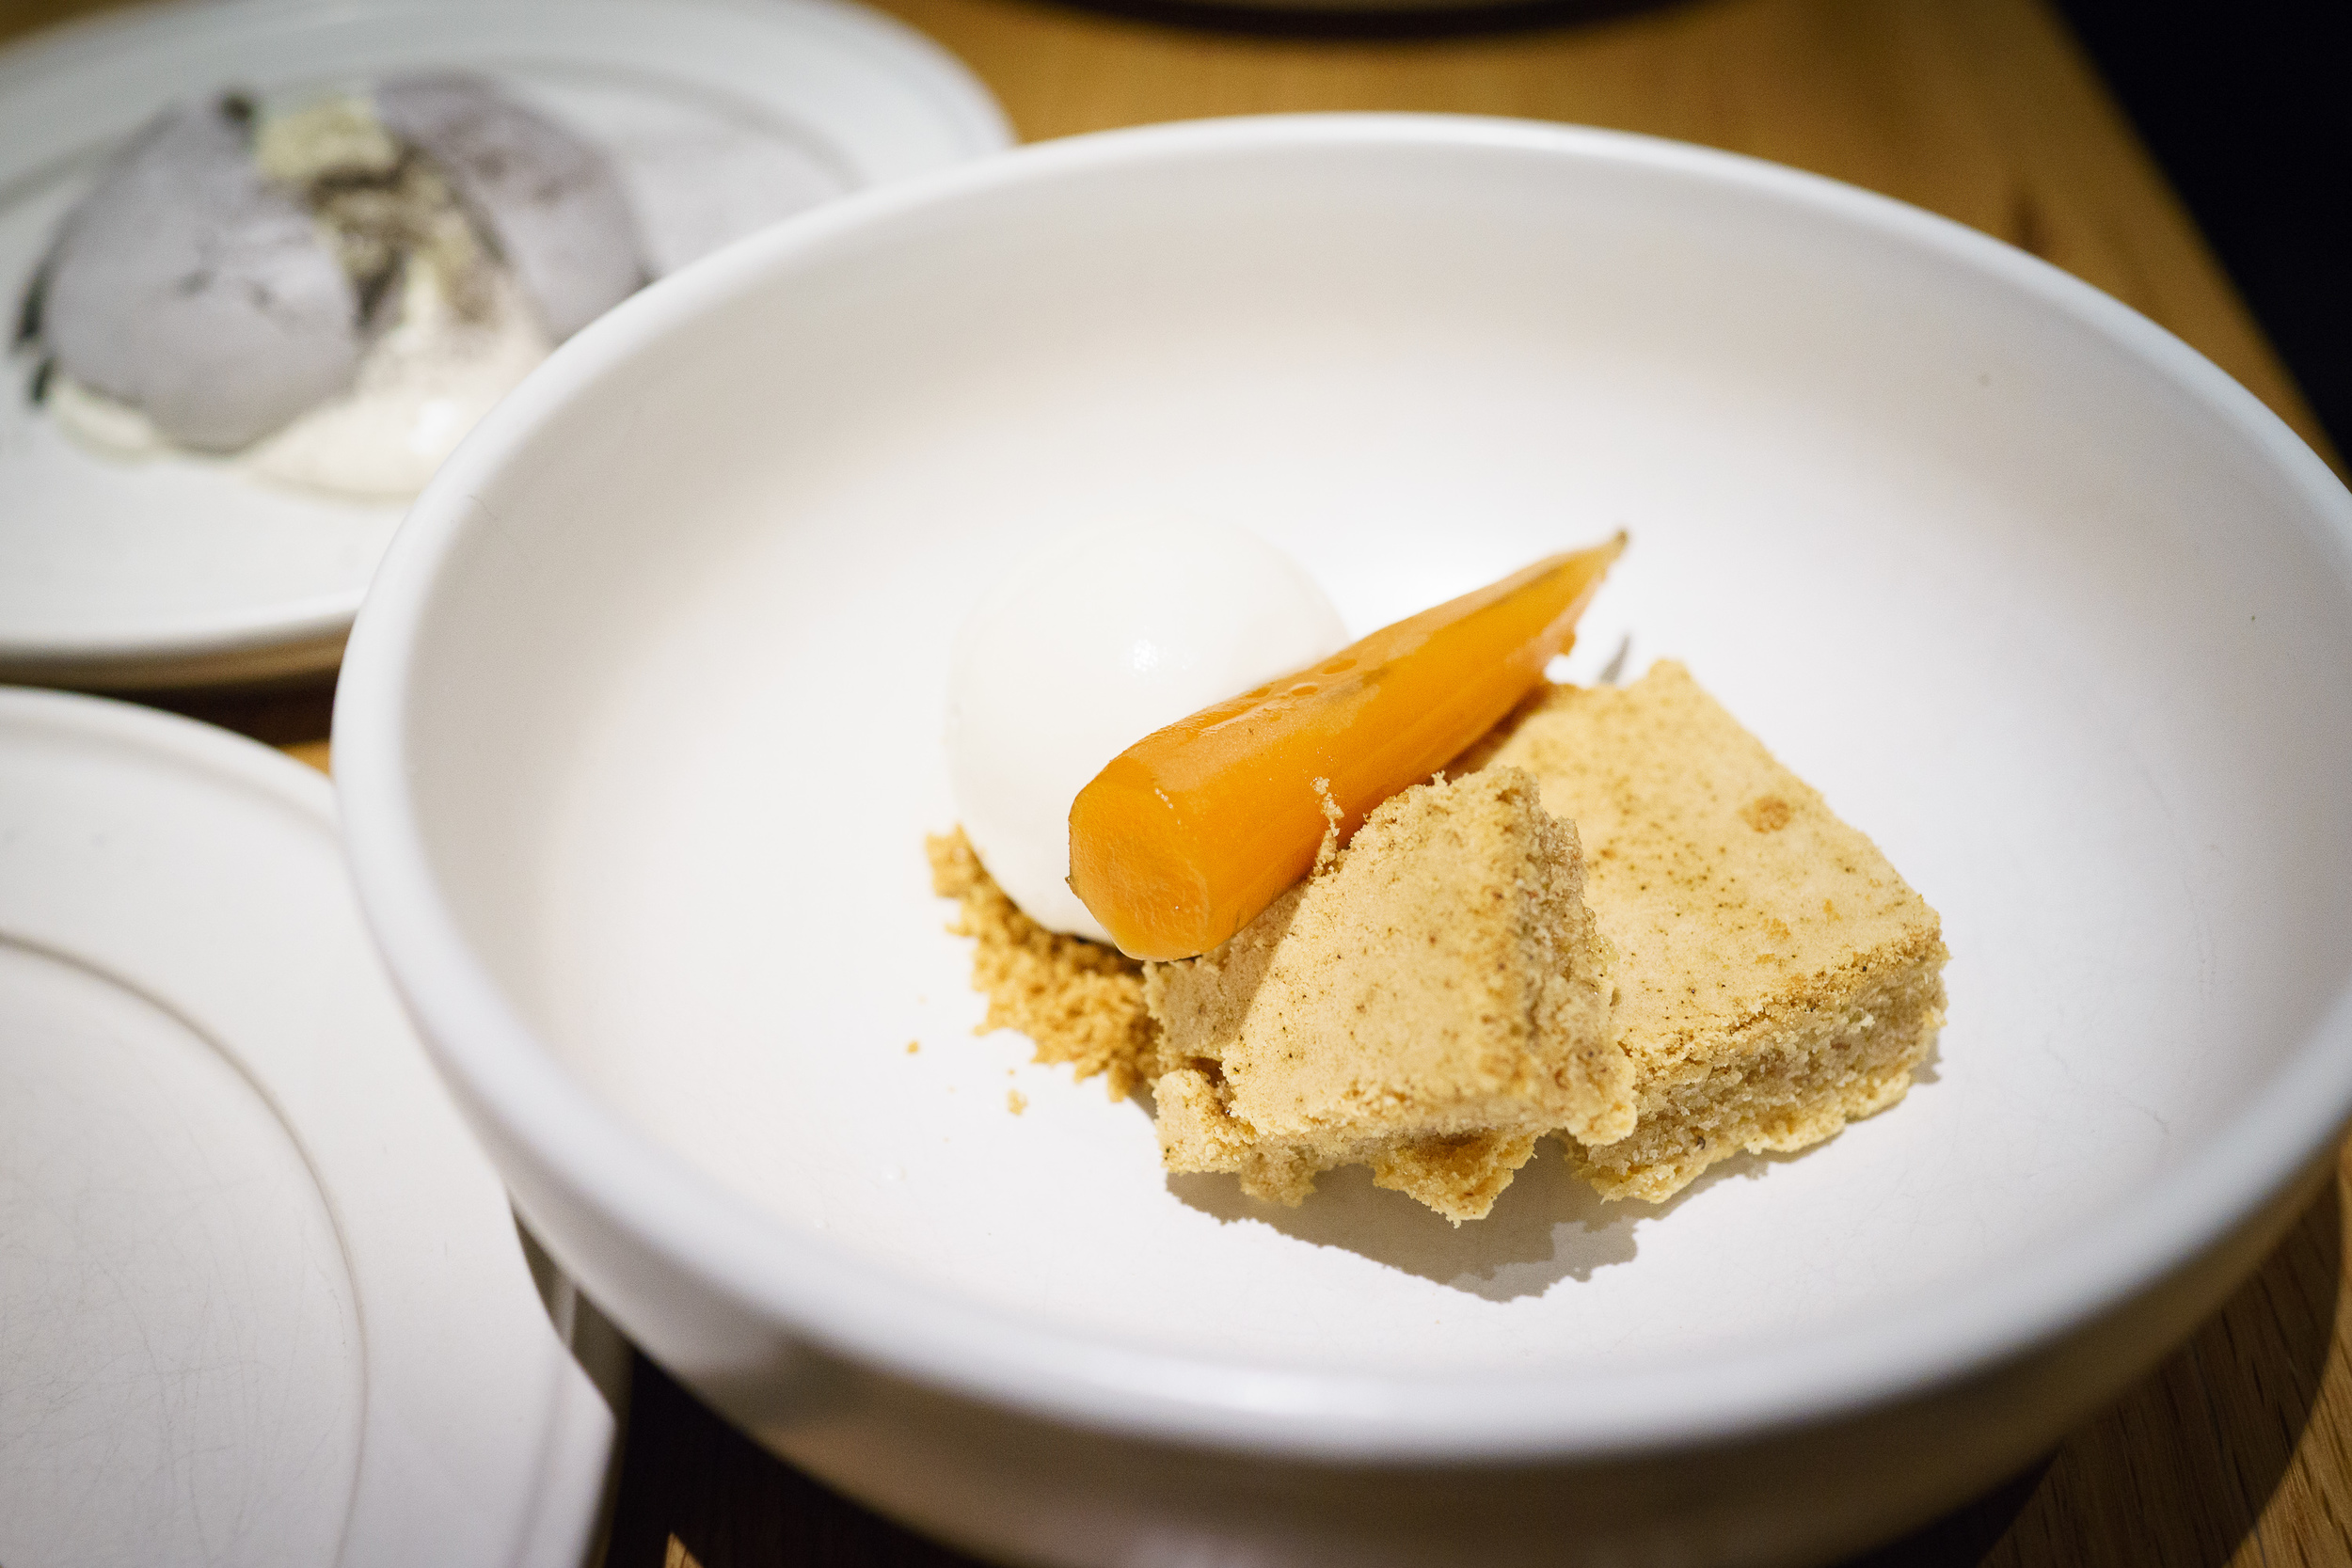 Nixtamalized carrot, cinnamon cake, cream cheese ice cream